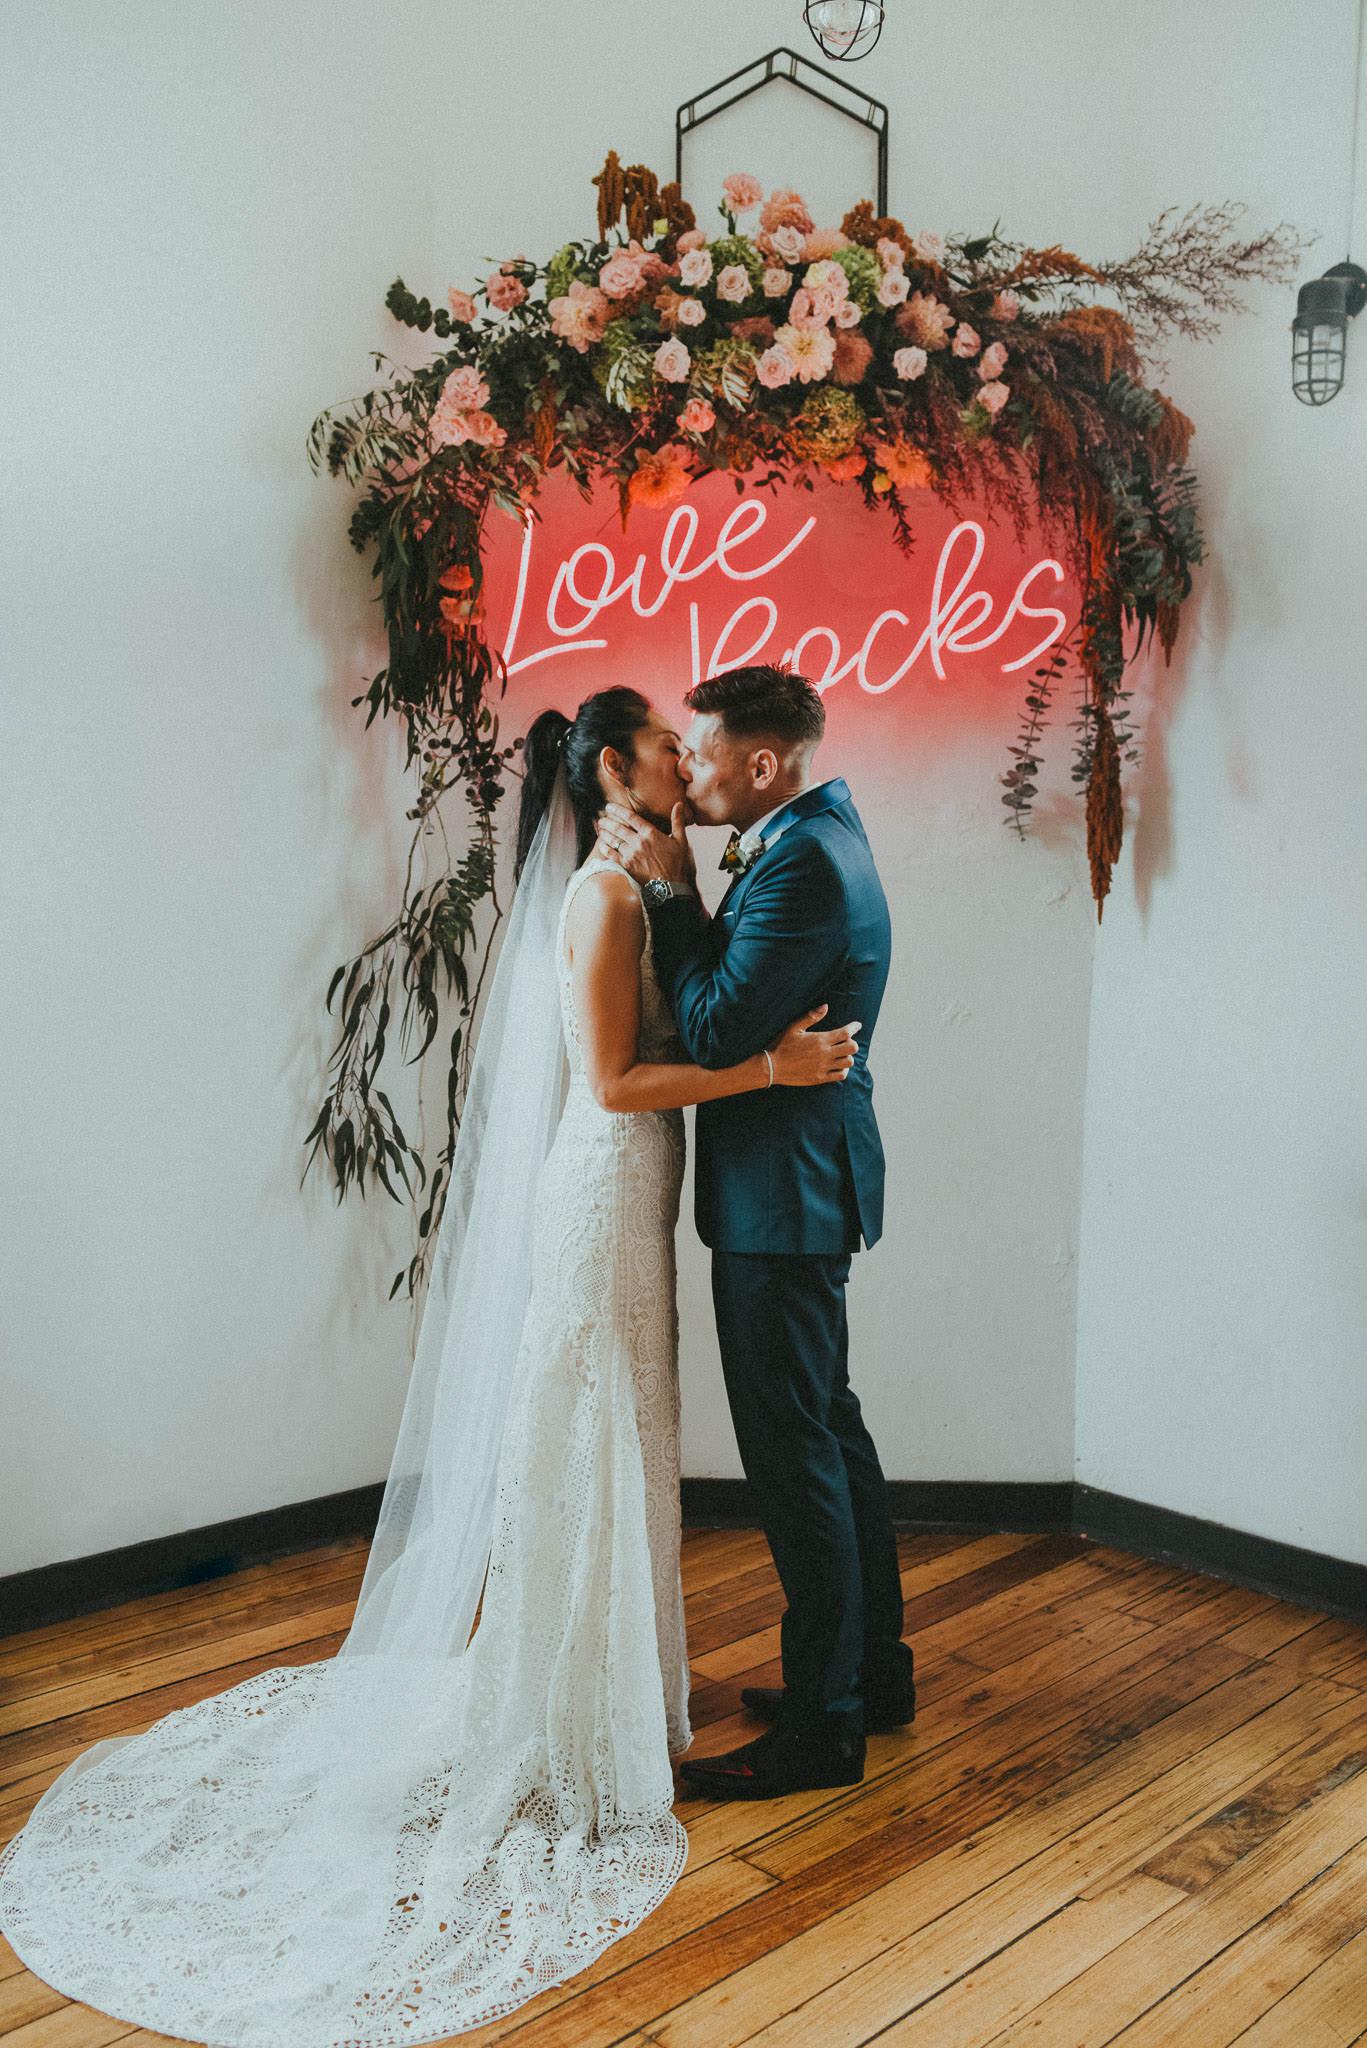 love rocks neon wedding sign